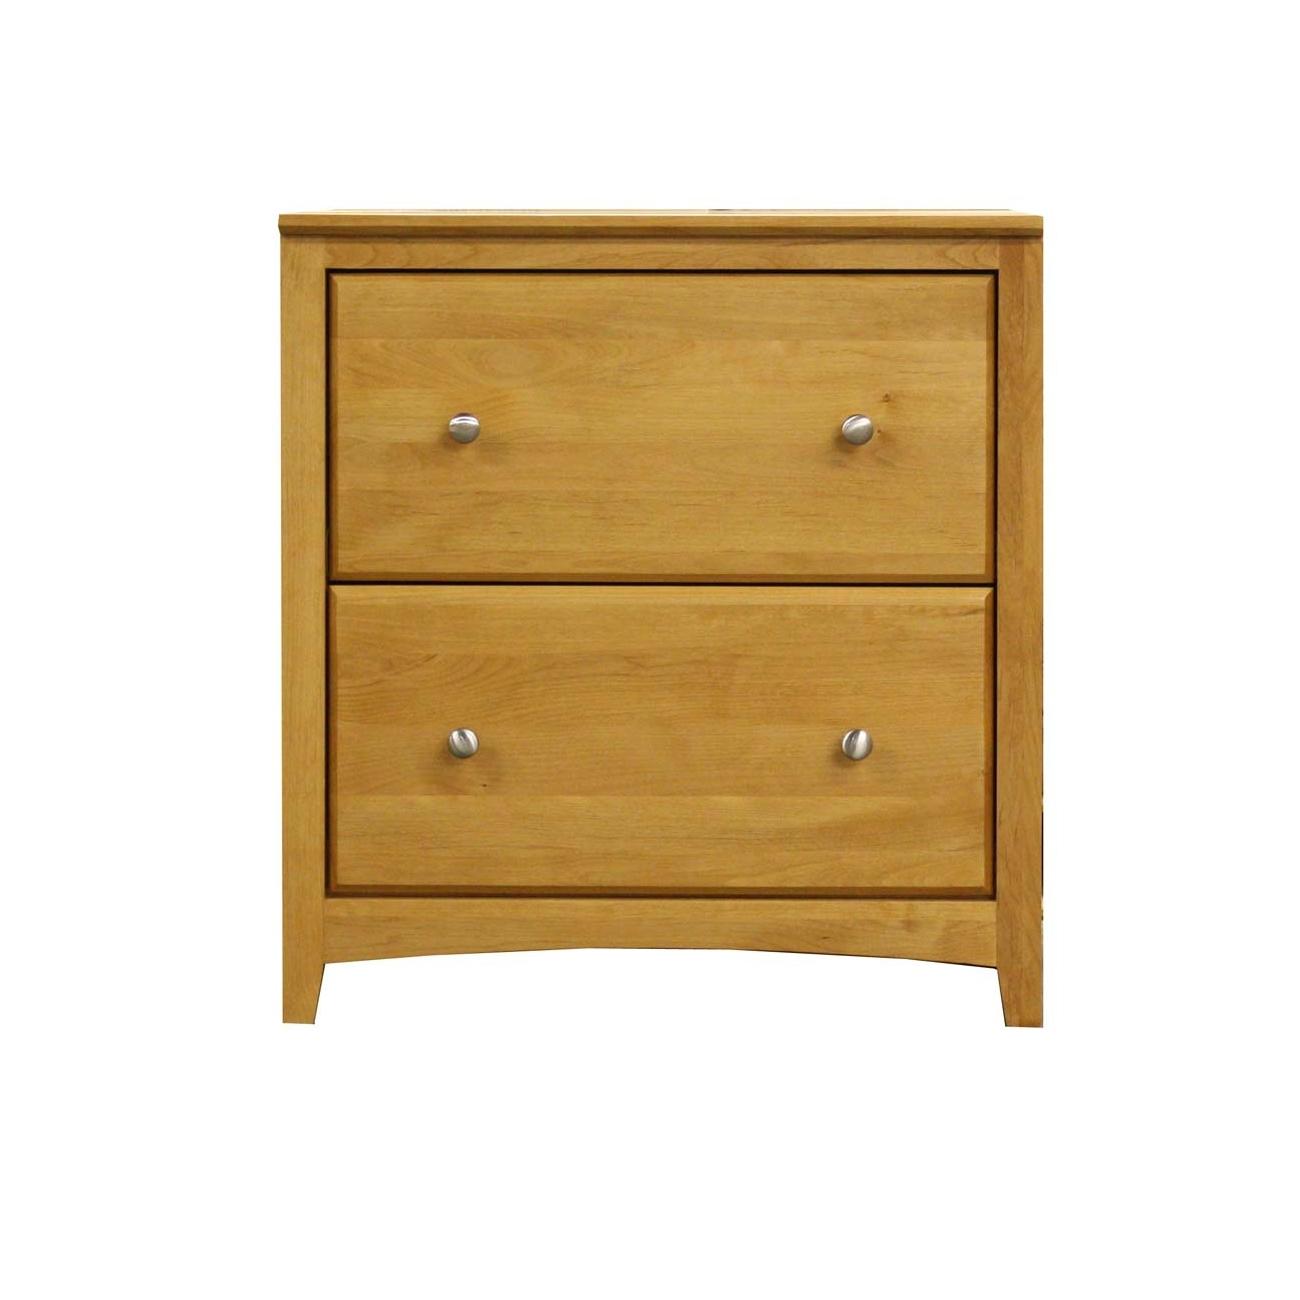 file cabinet - Archbold - 2 drawer file cabinet modular office - Finished.jpg